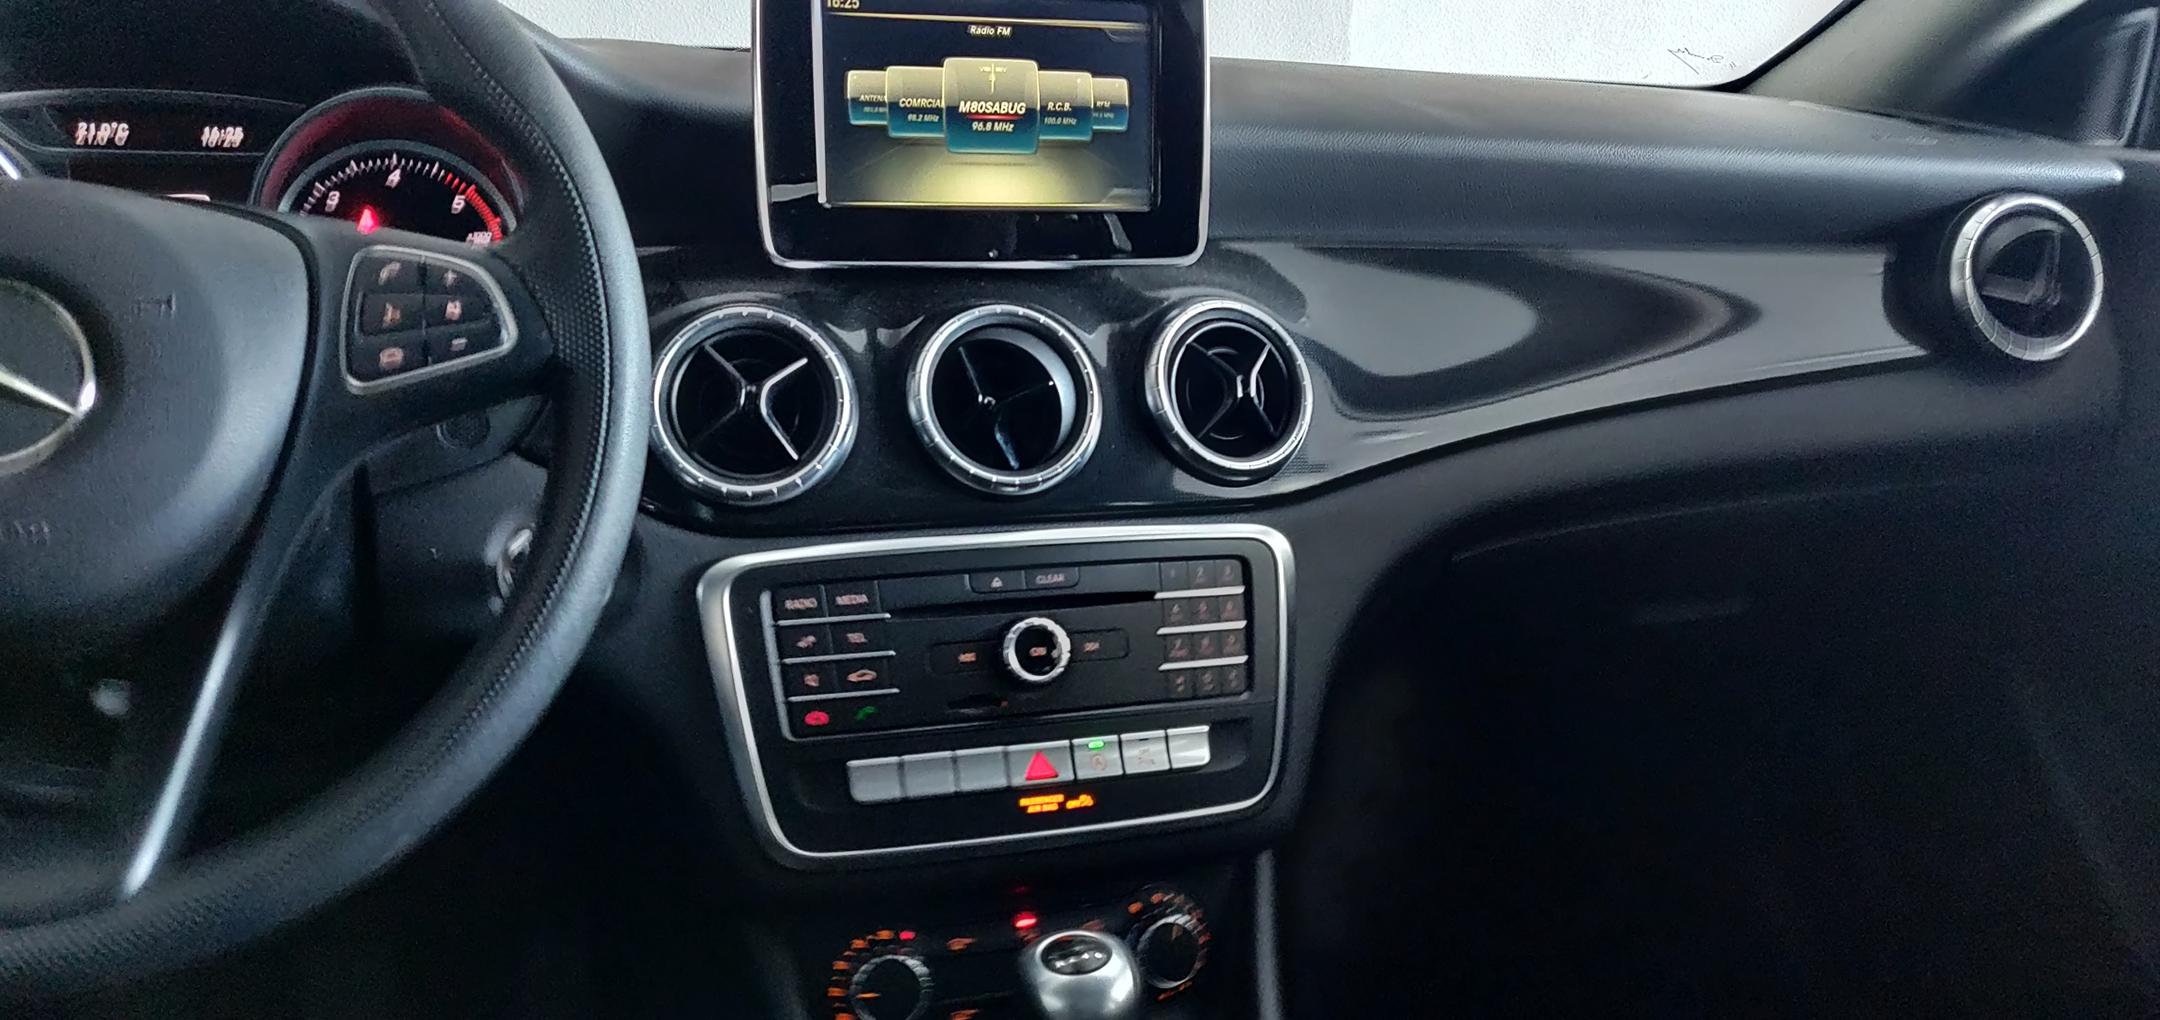 Mercedes-Benz CLA 180 1.5 Style | Imagem 11